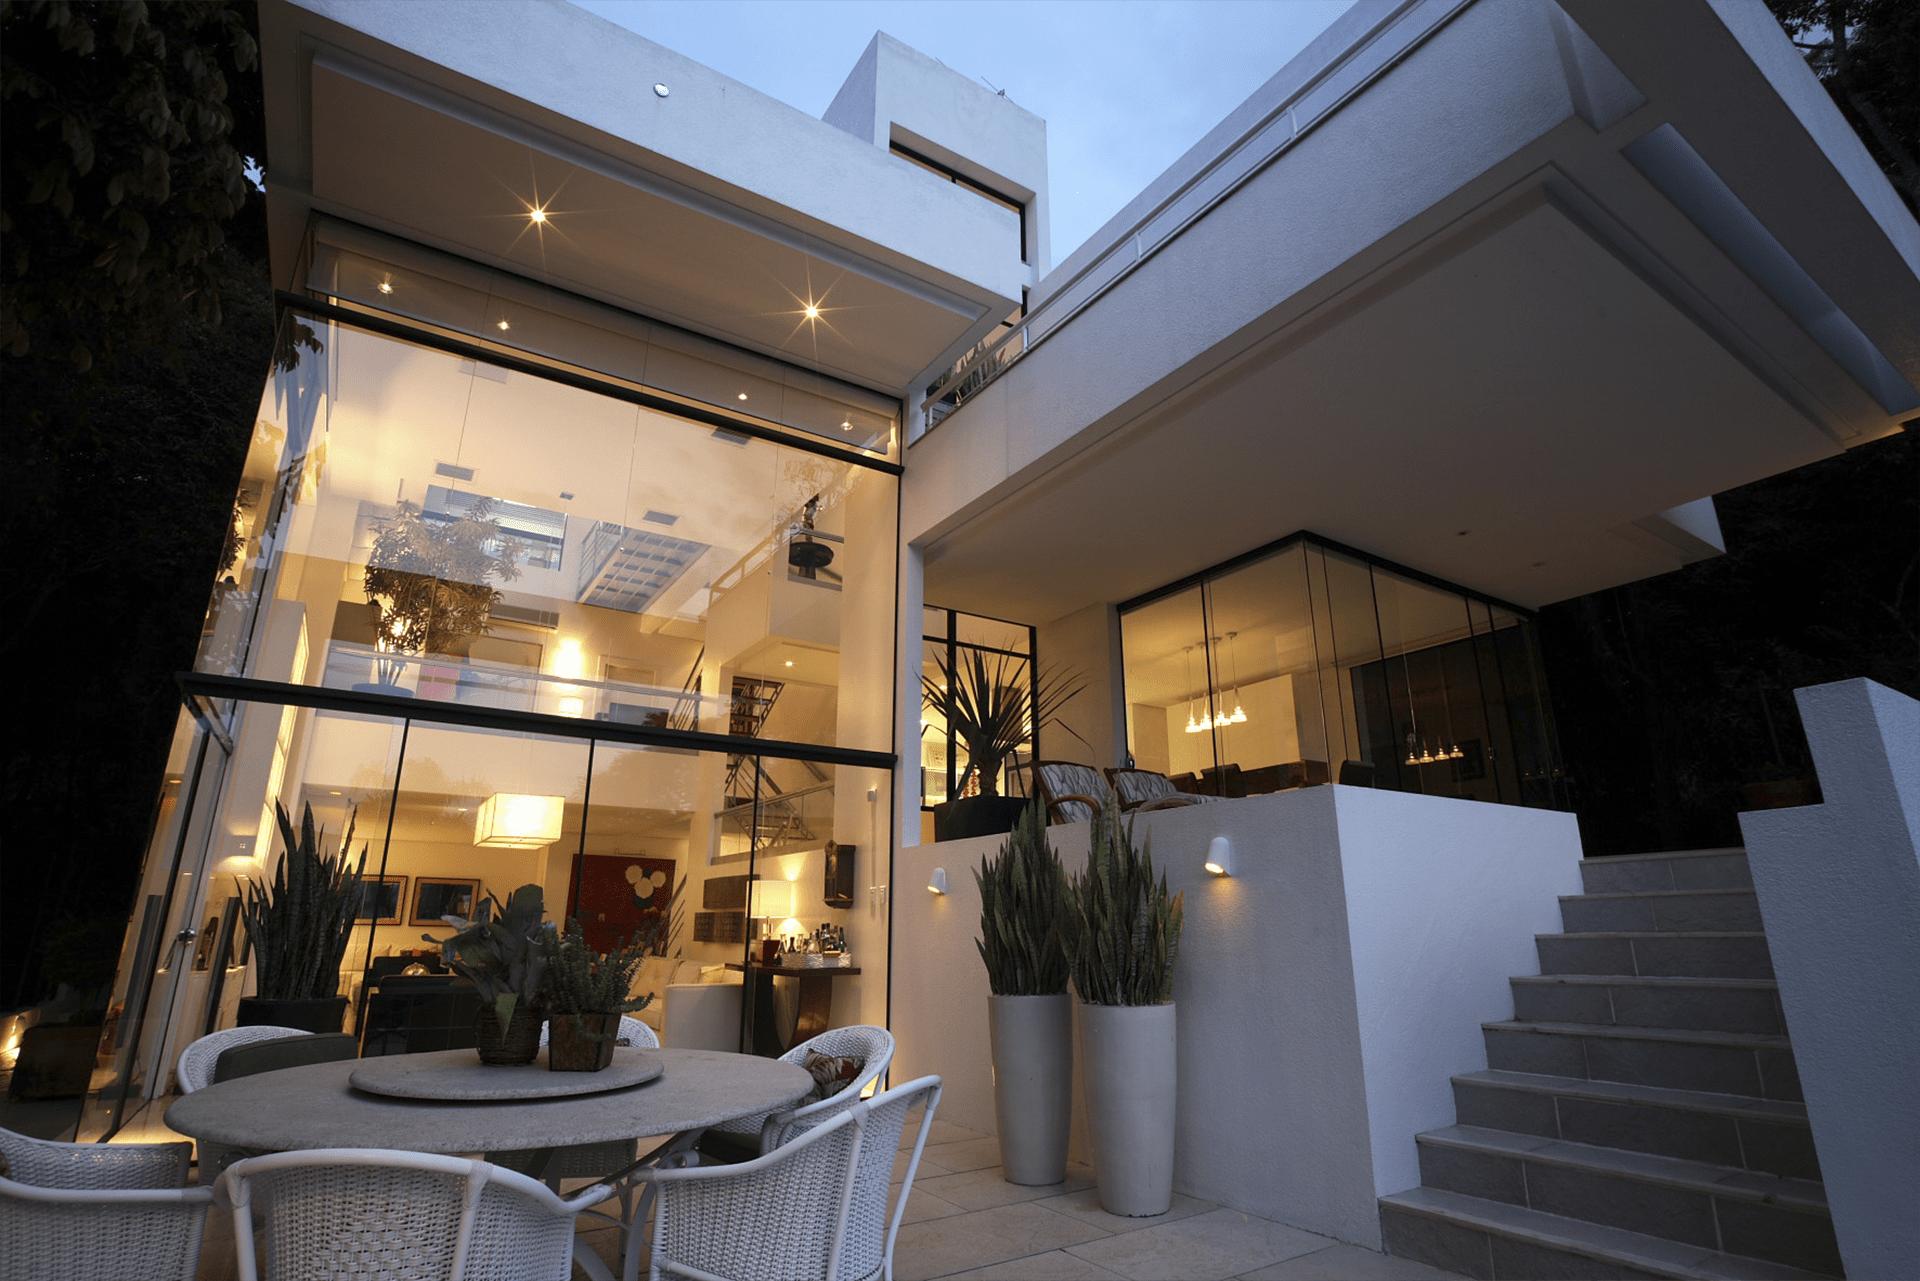 Casa Canto da Lagoa